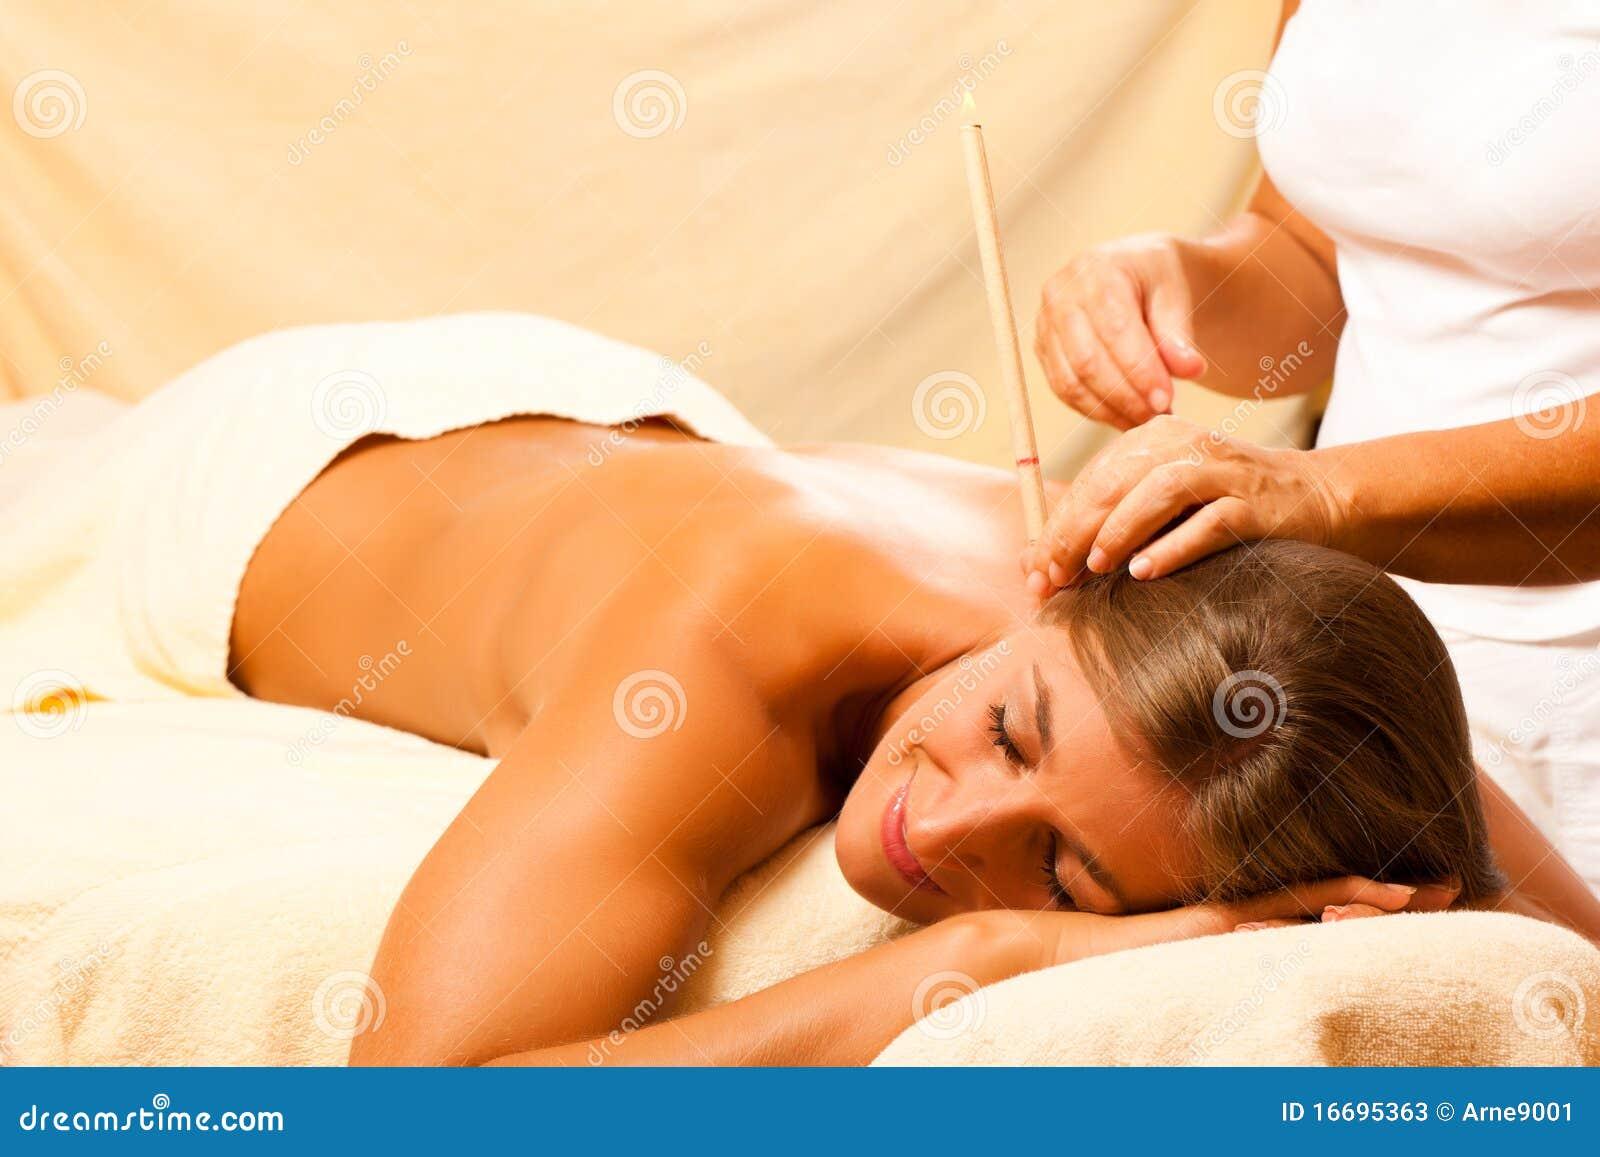 knapste vrouw intieme massage